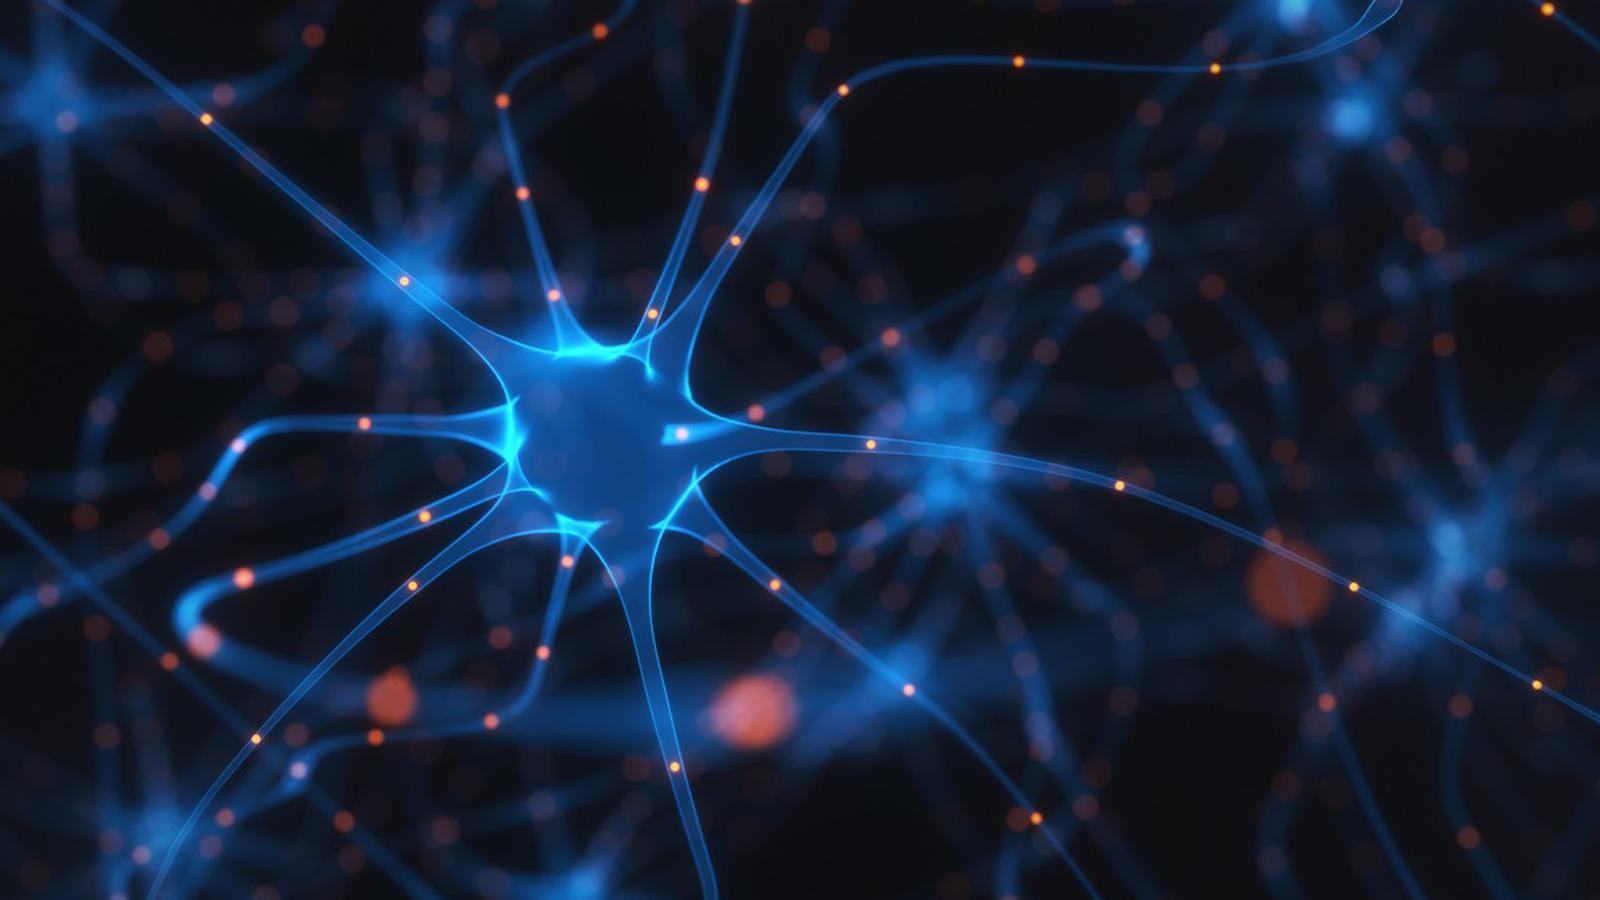 Bringing neuroscience to the masses